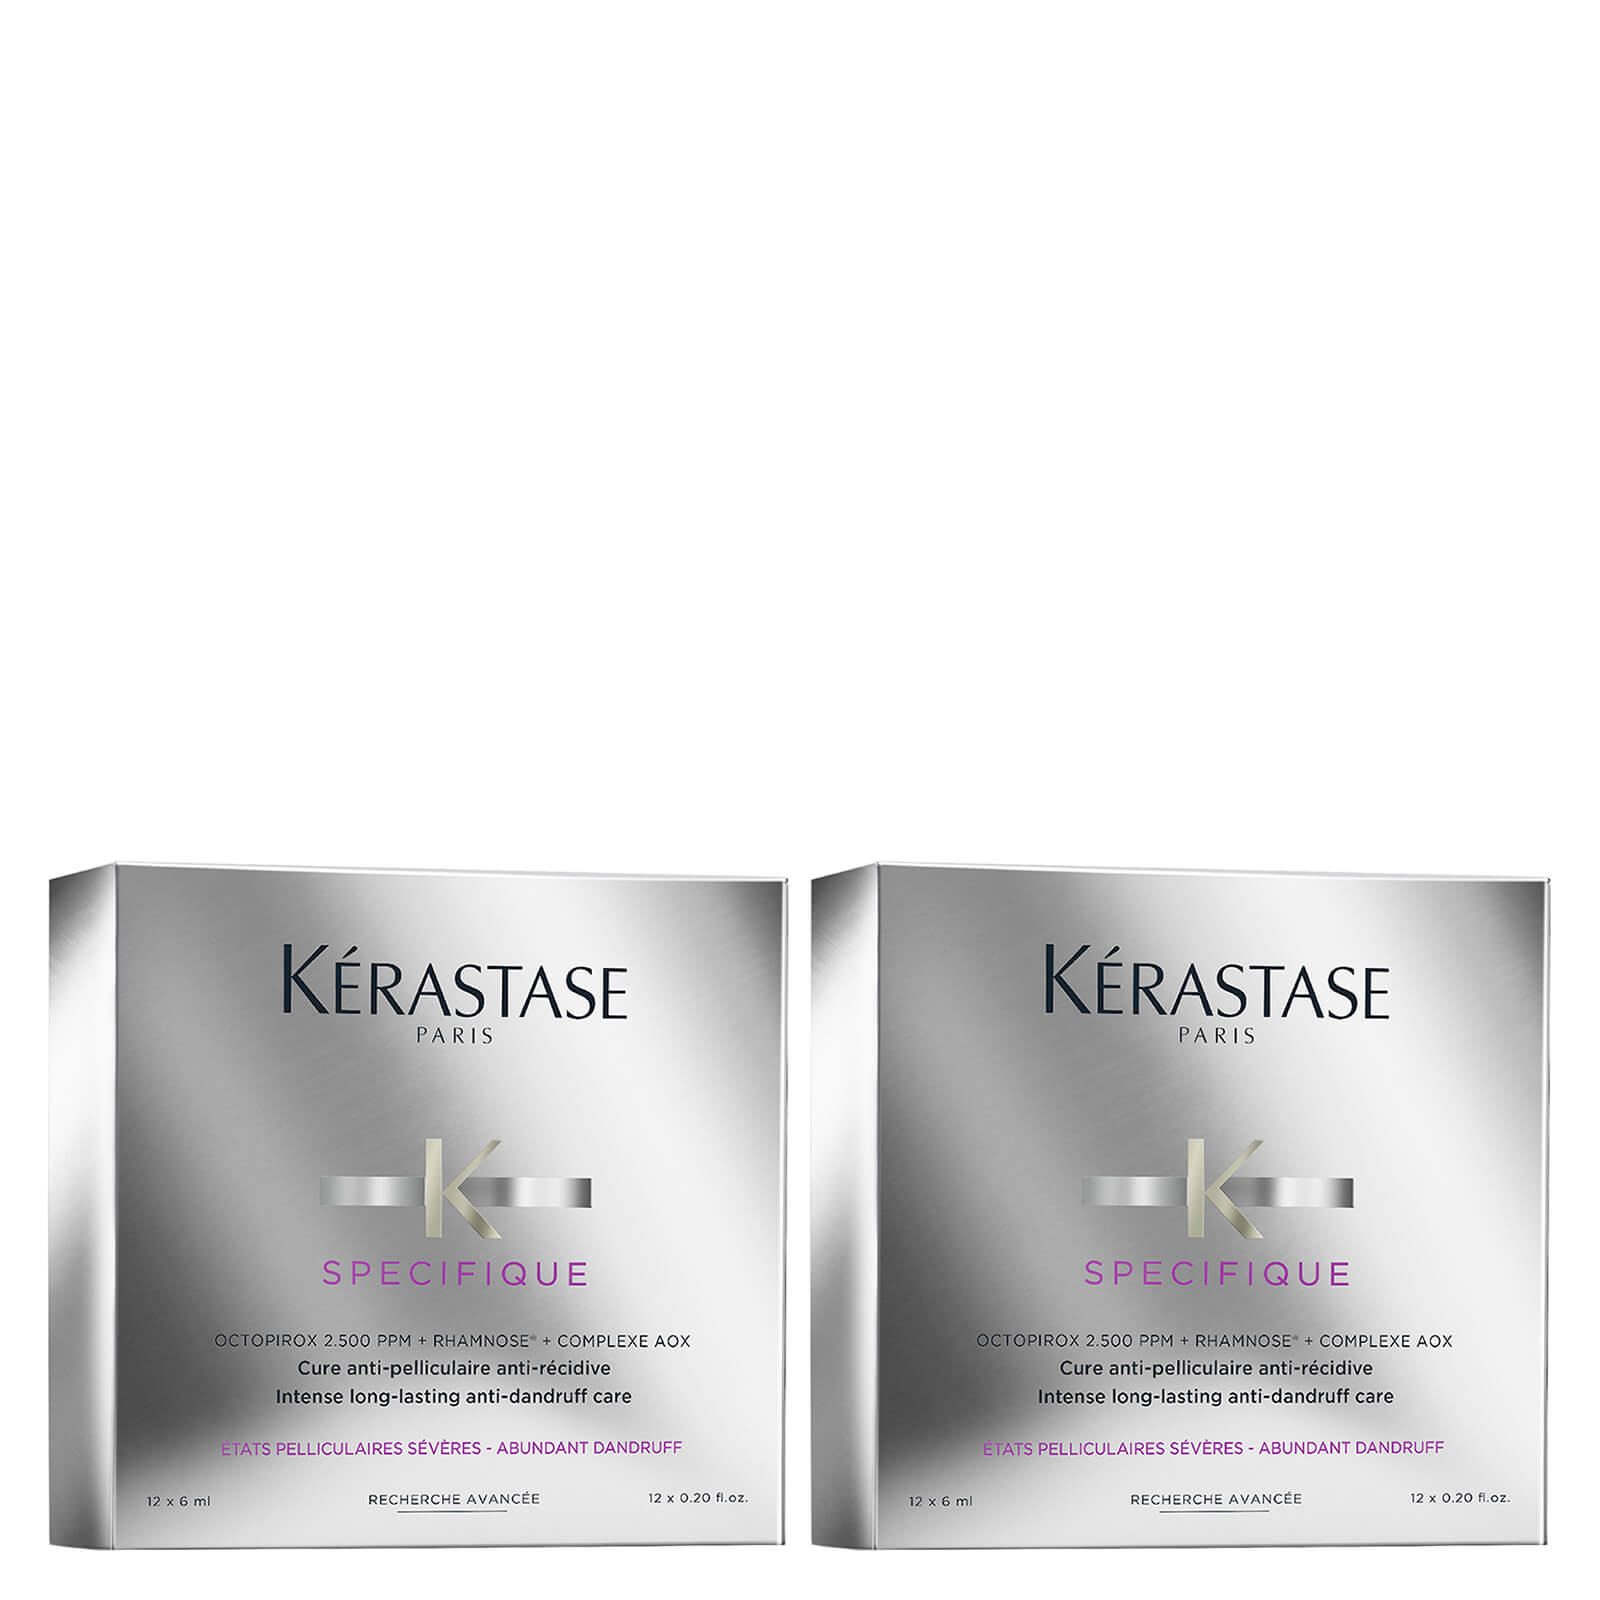 Kérastase Specifique Cure Anti-Pelliculaire Anti-Recidive Treatment 12 x 6ml Duo